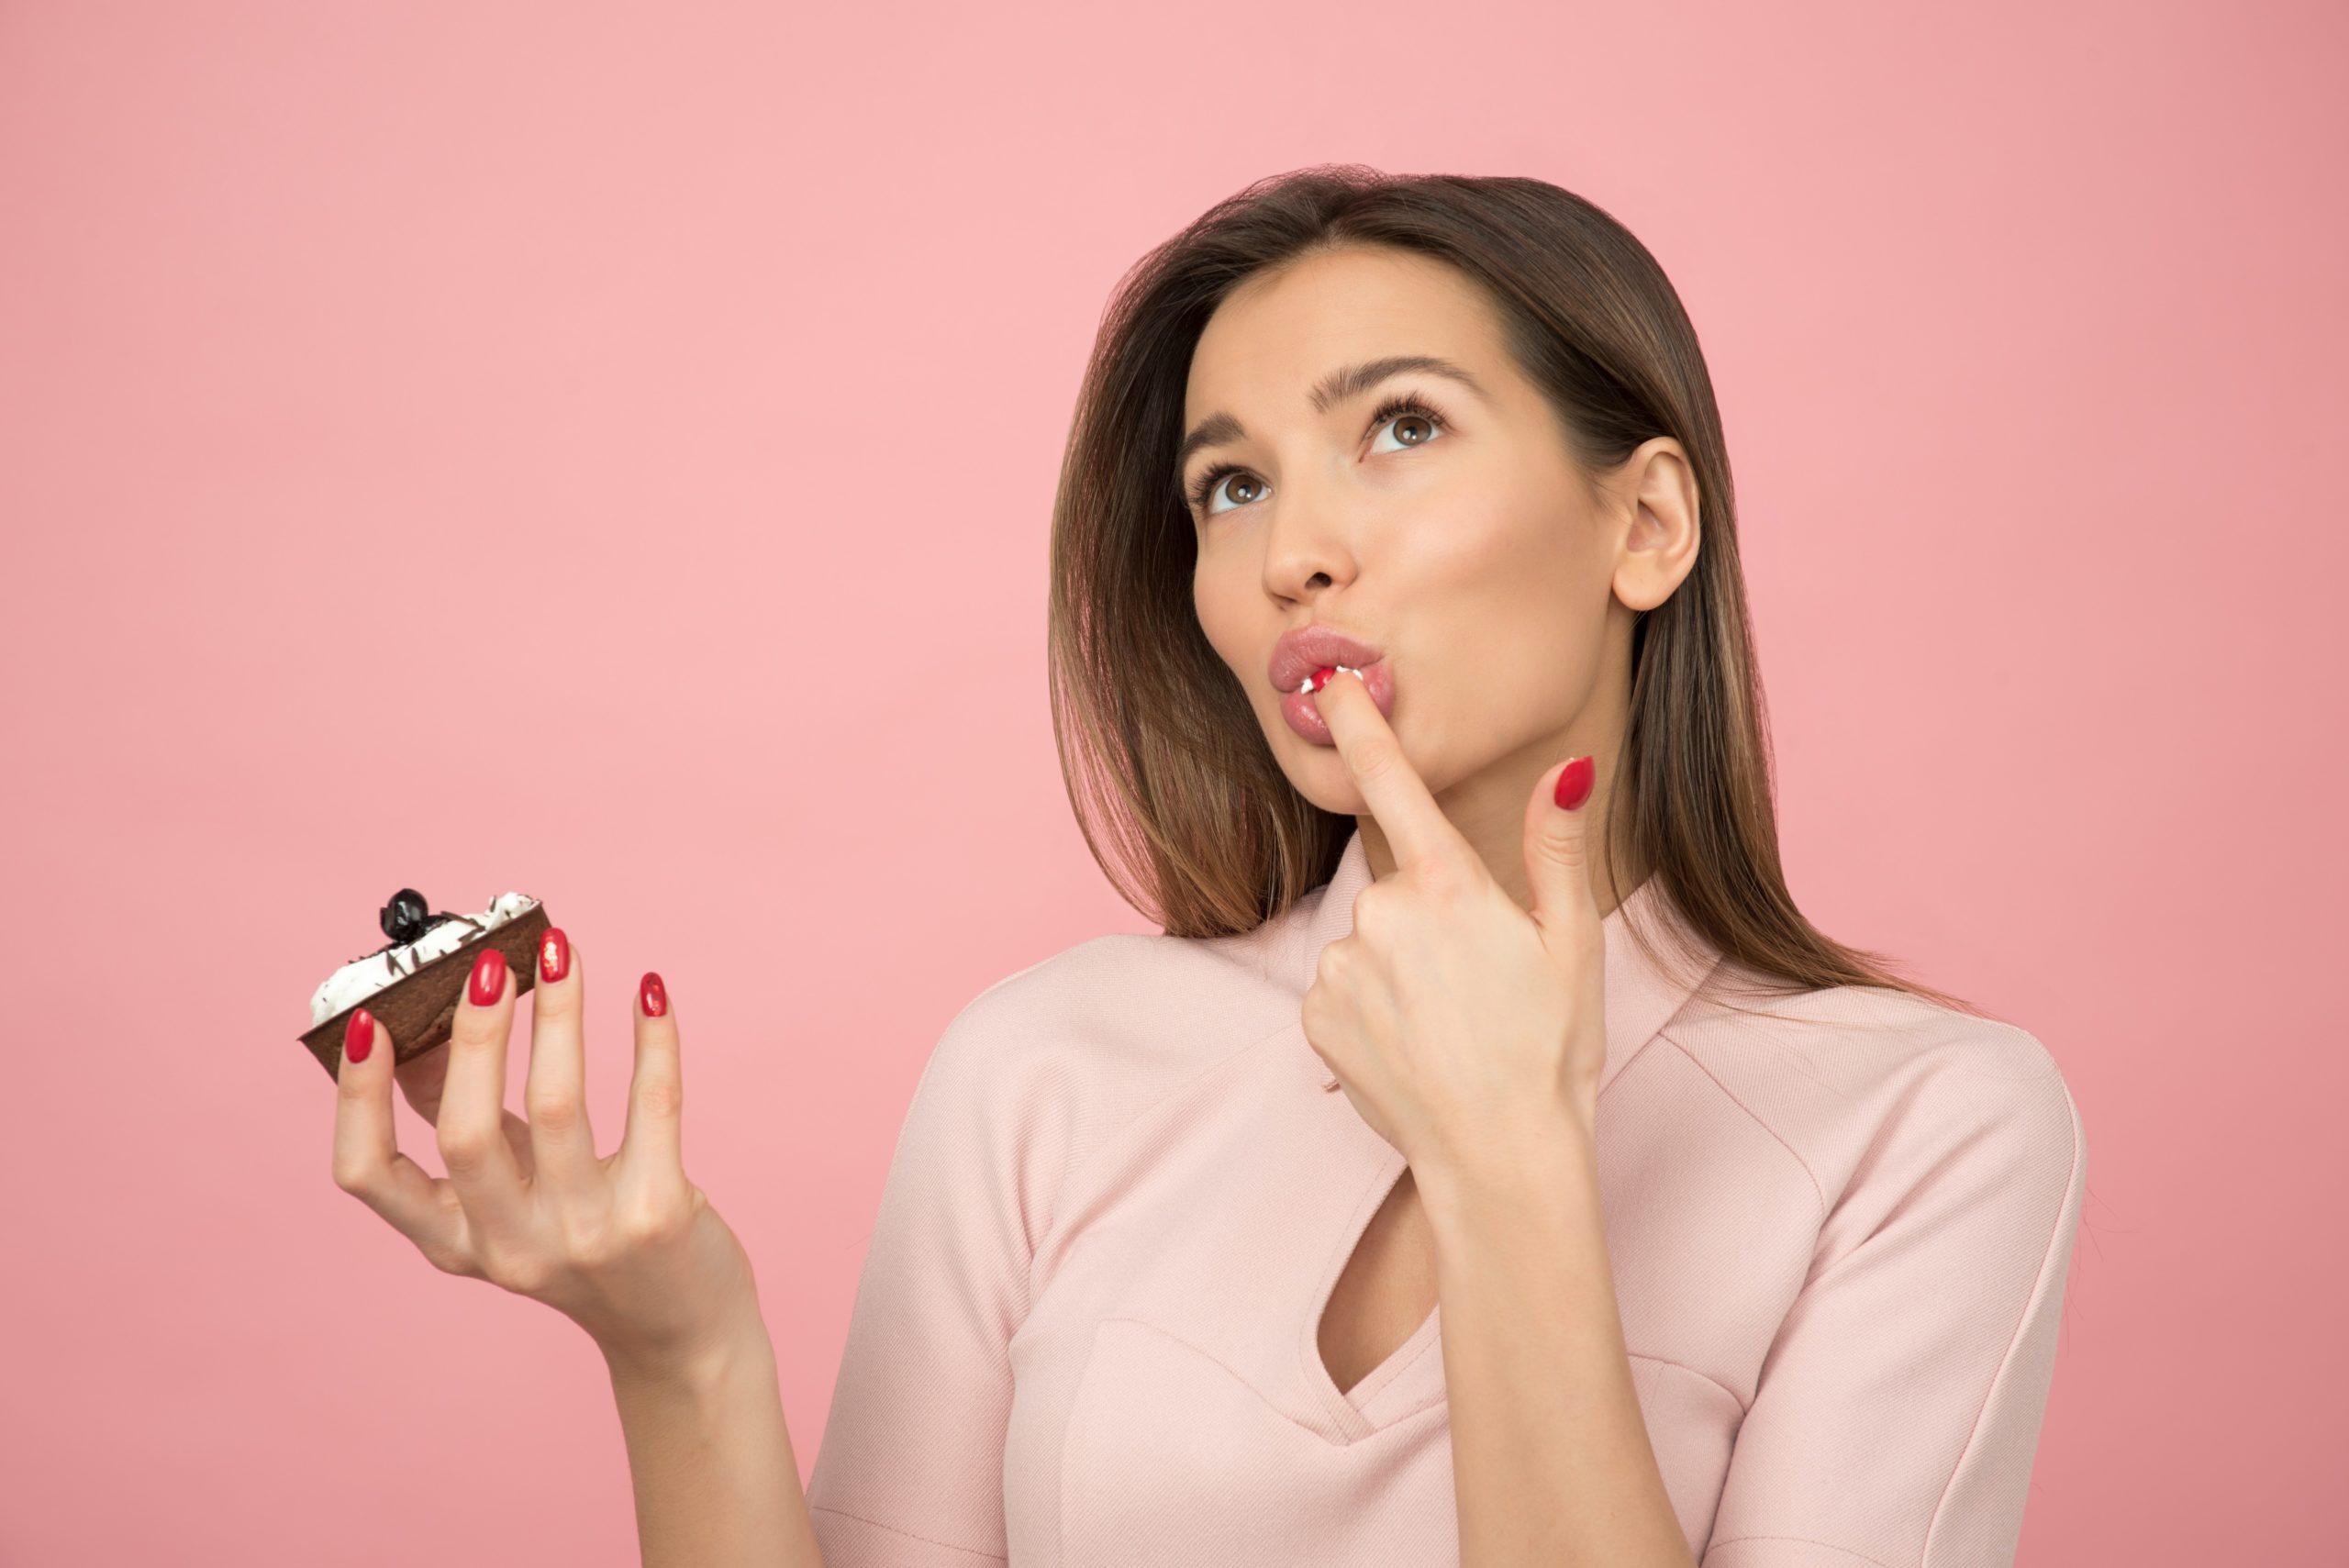 Mangiare consapevolmente: la Mindful Eating